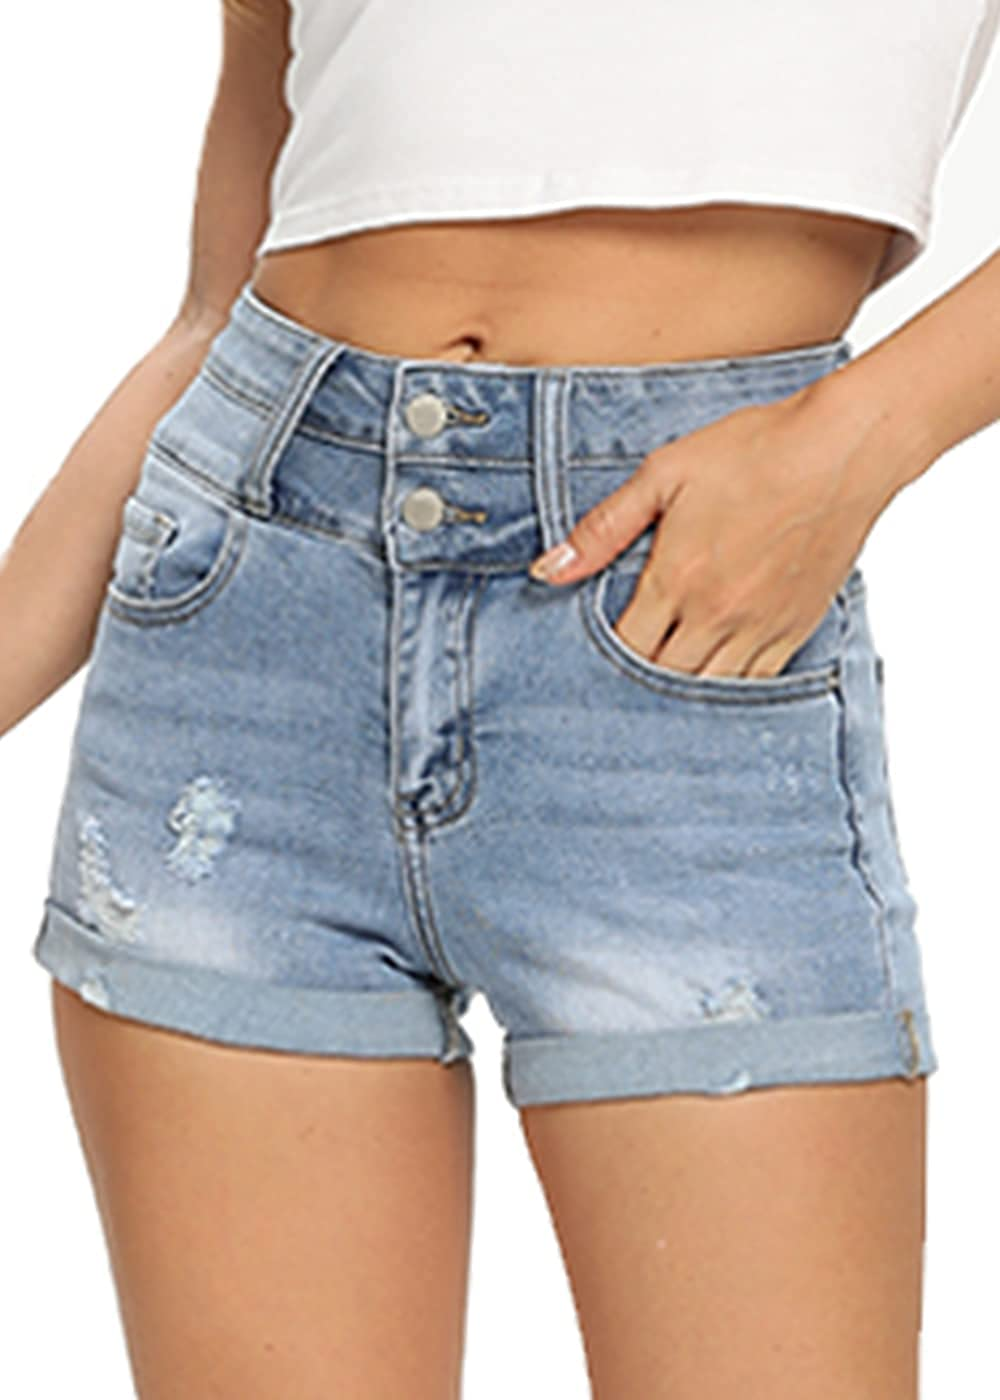 Women's Casual Mid Rise Denim Shorts Stretchy Ripped Folded Hem Jean Short (Light Blue # 4, 10)